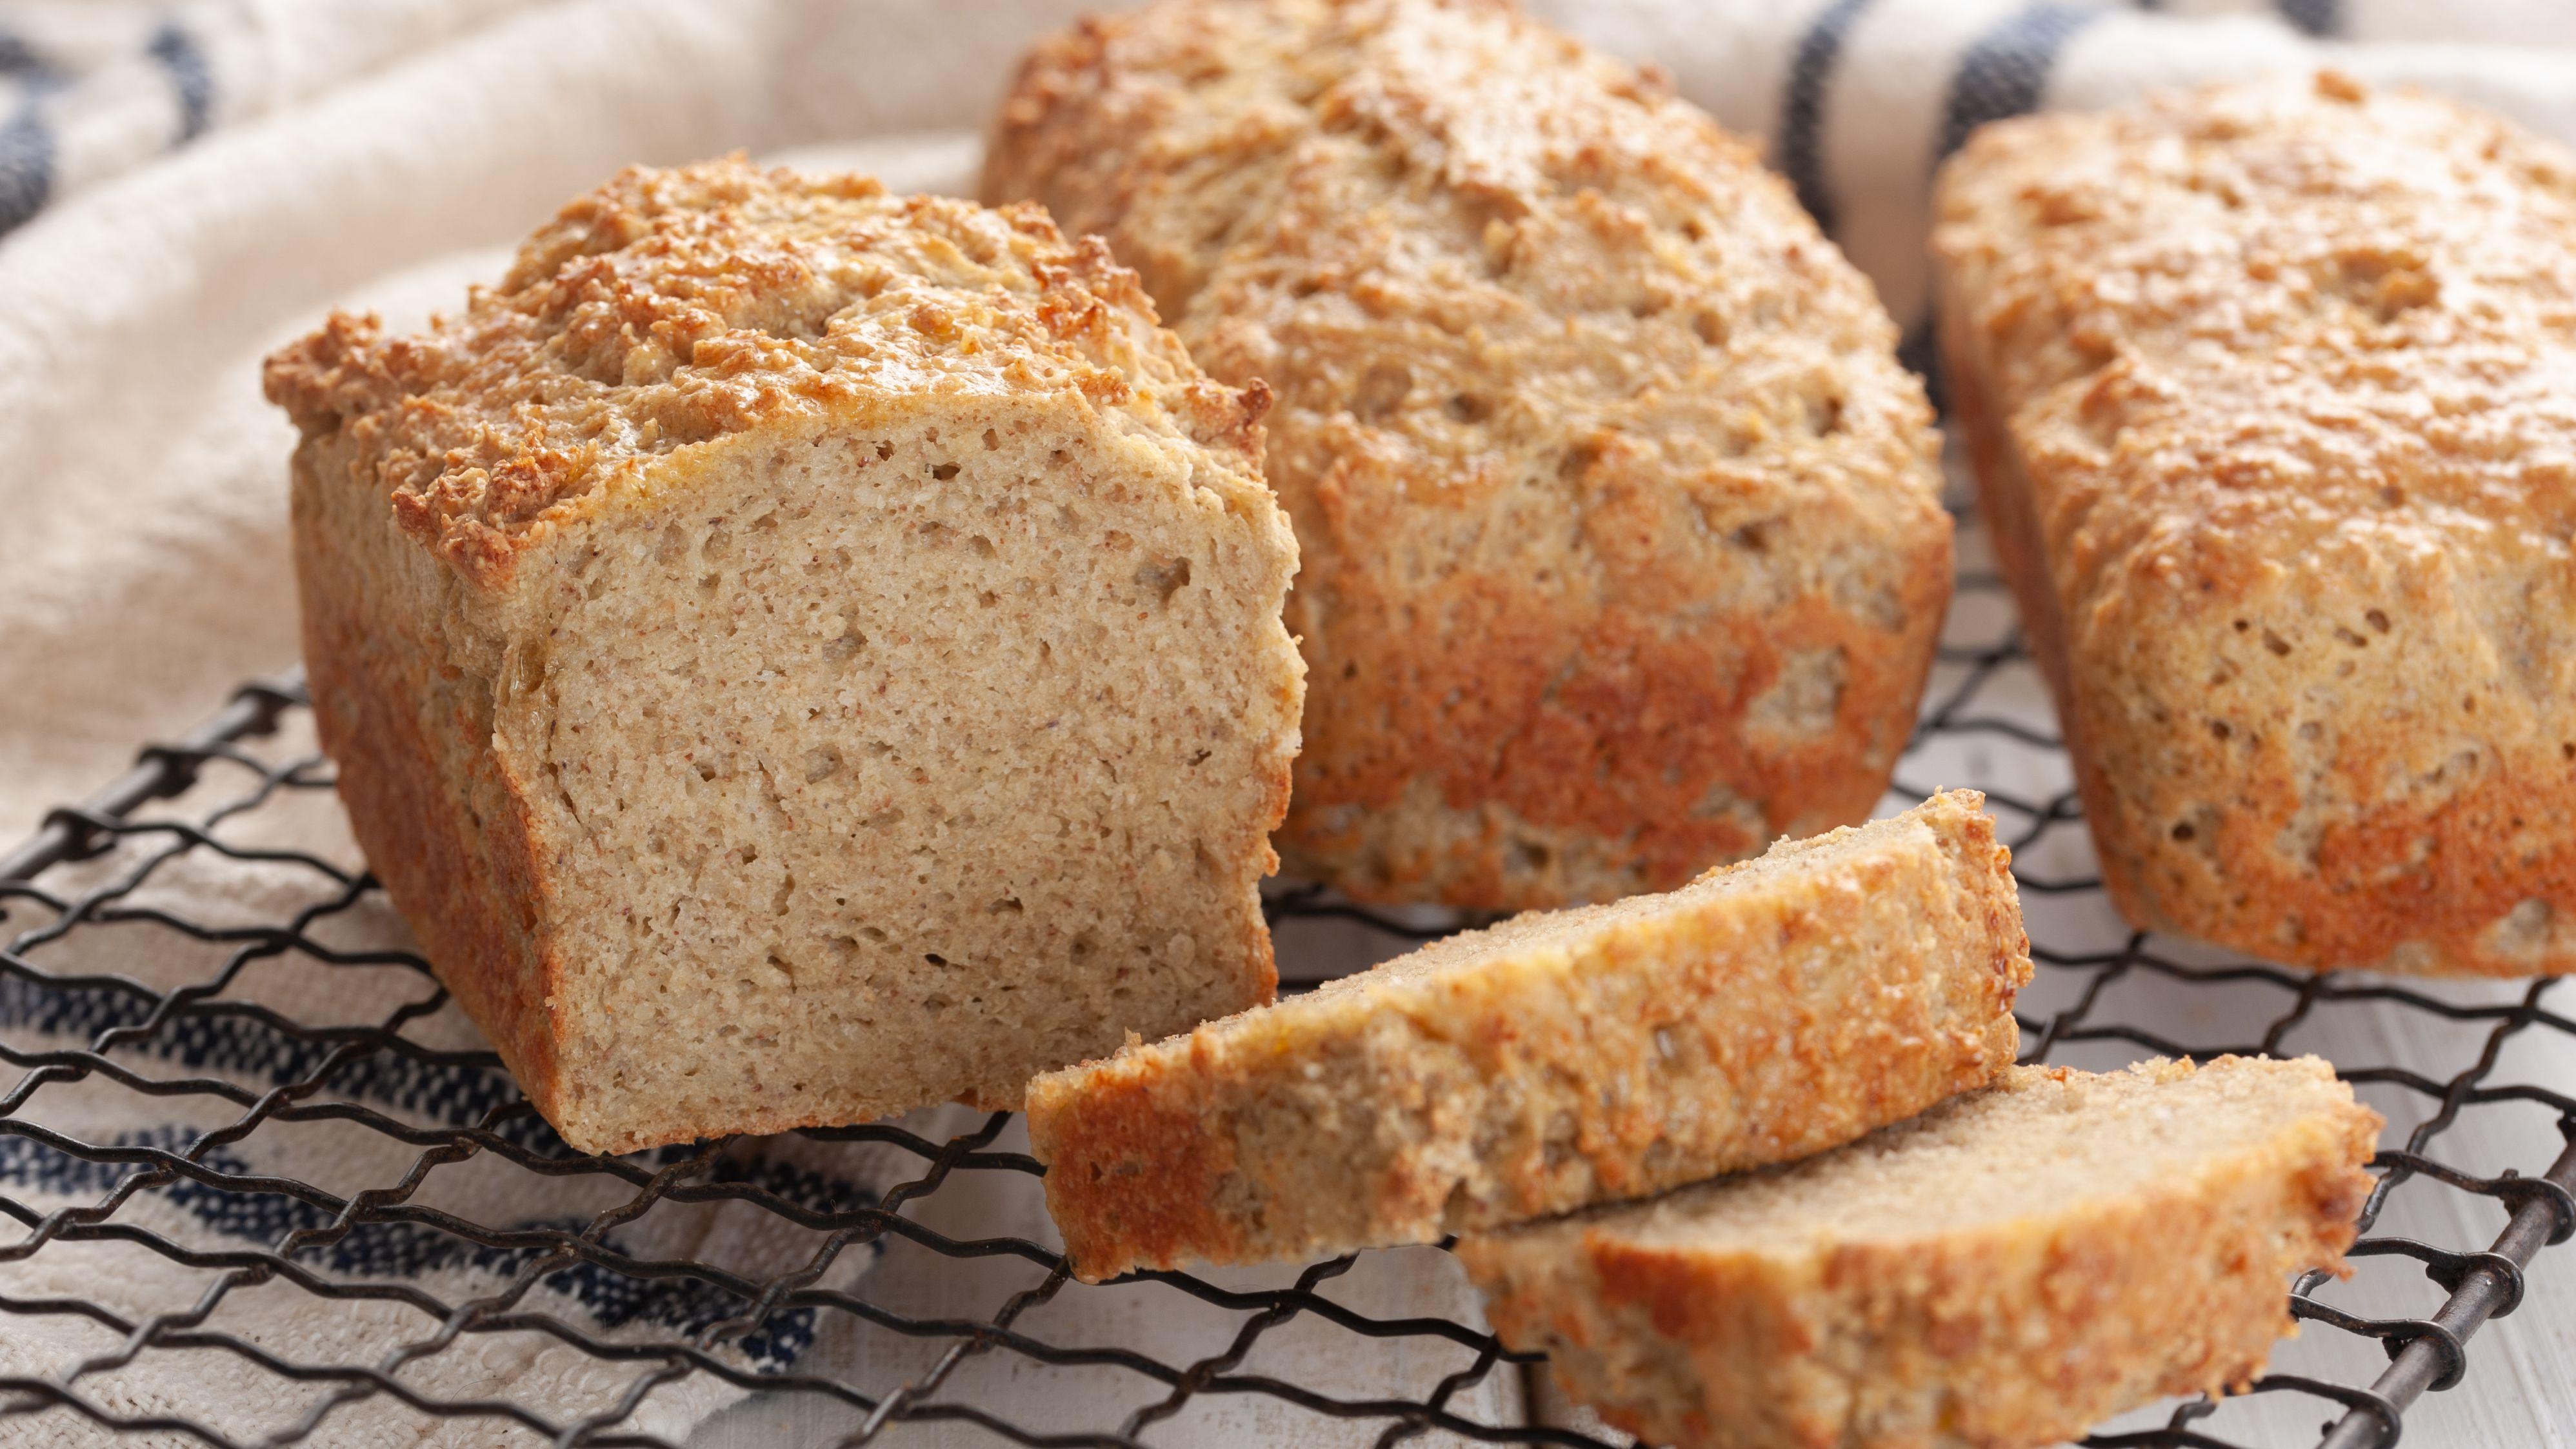 Gluten Free And Rice Free Buckwheat Bread Recipe